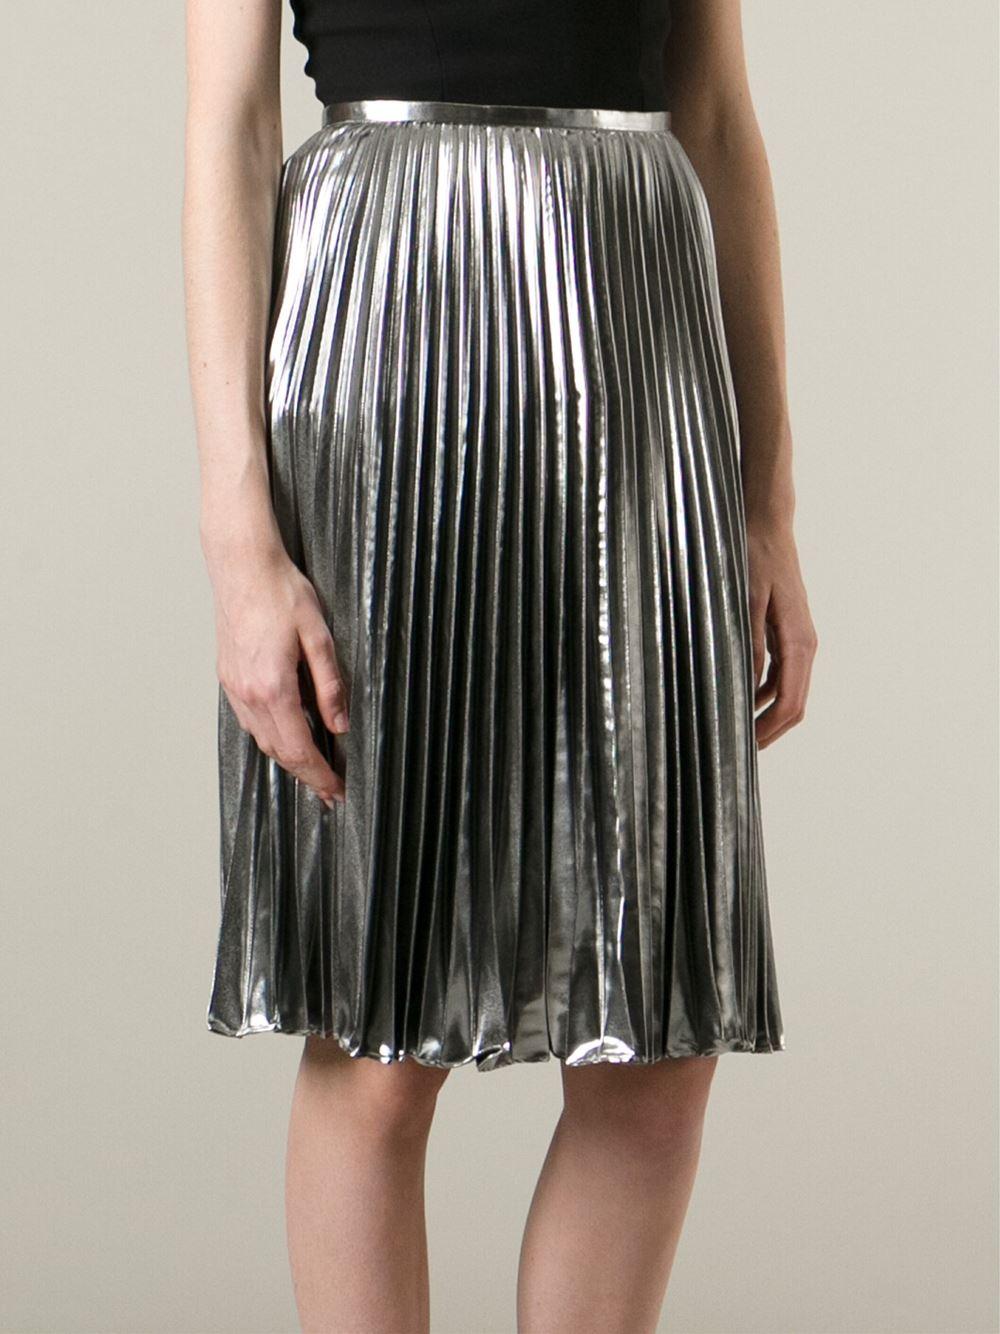 Michael michael kors Pleated Metallic Skirt in Metallic | Lyst